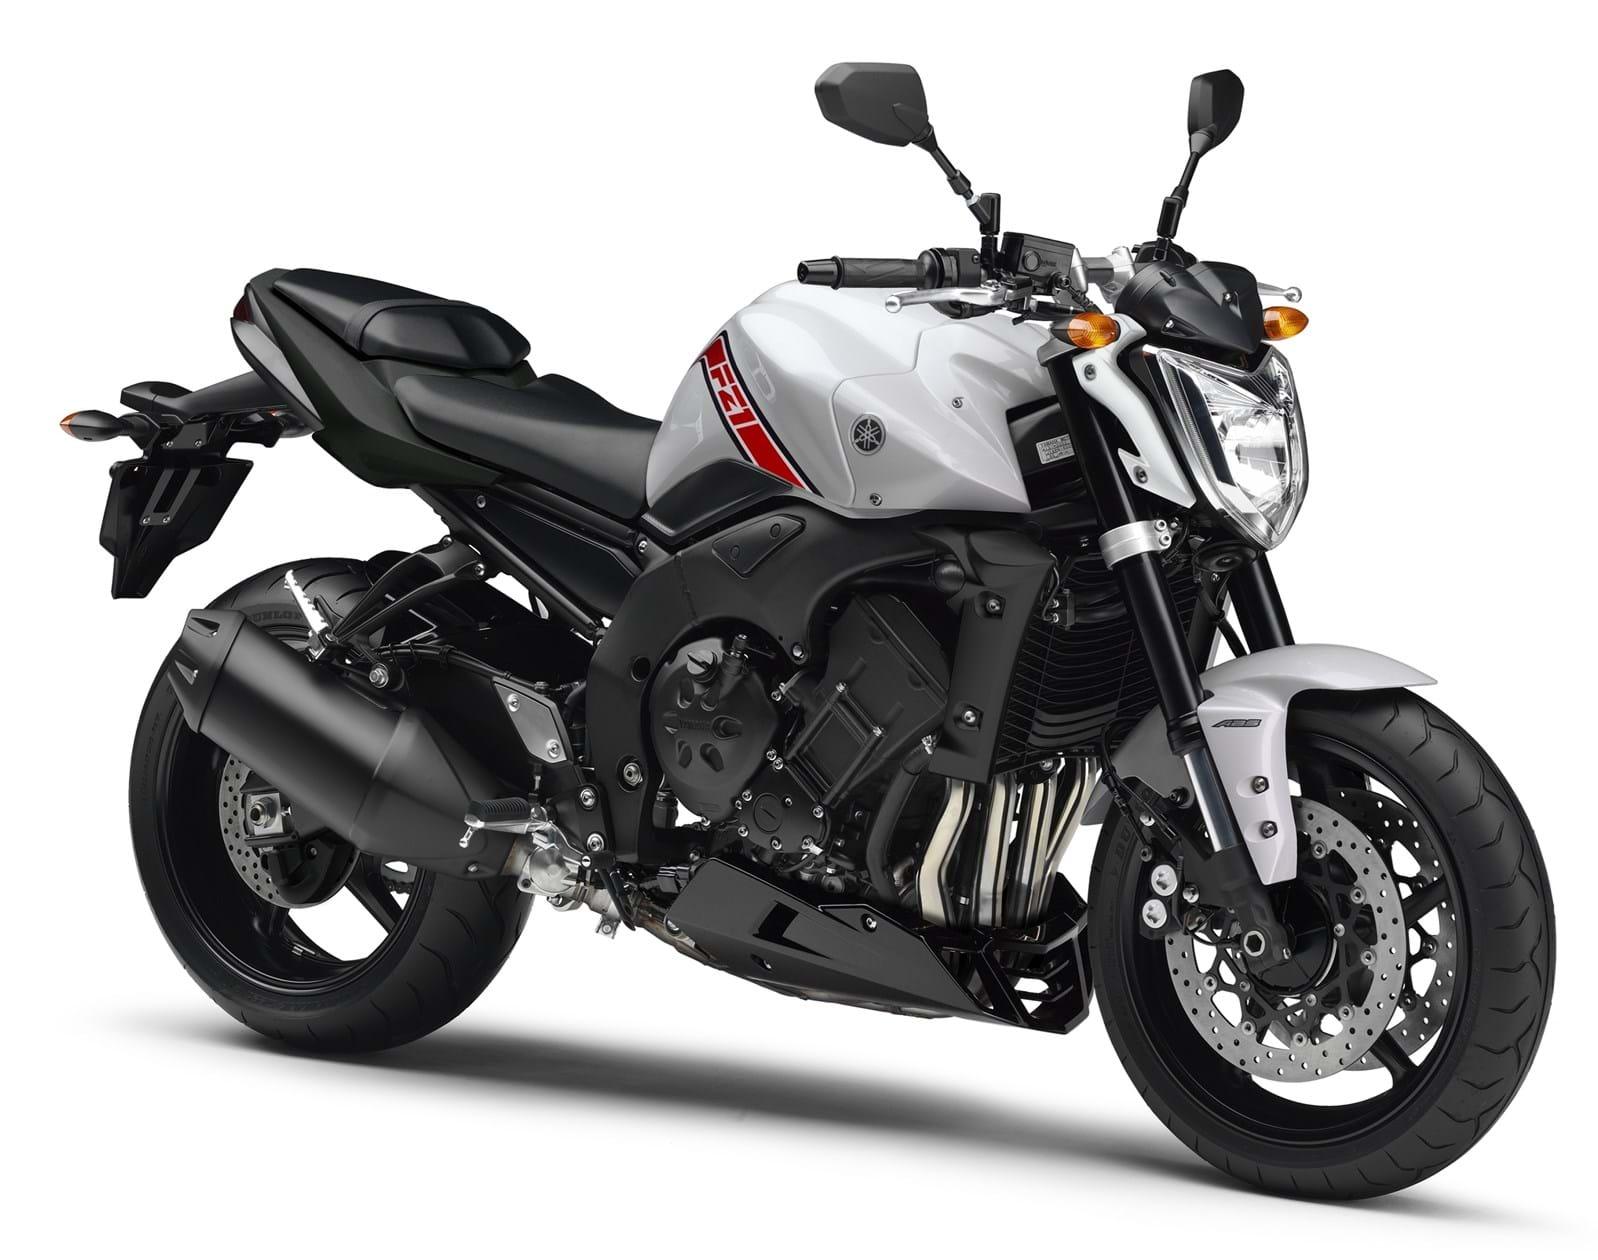 Yamaha FZ1 • For Sale • Price Guide • The Bike Market